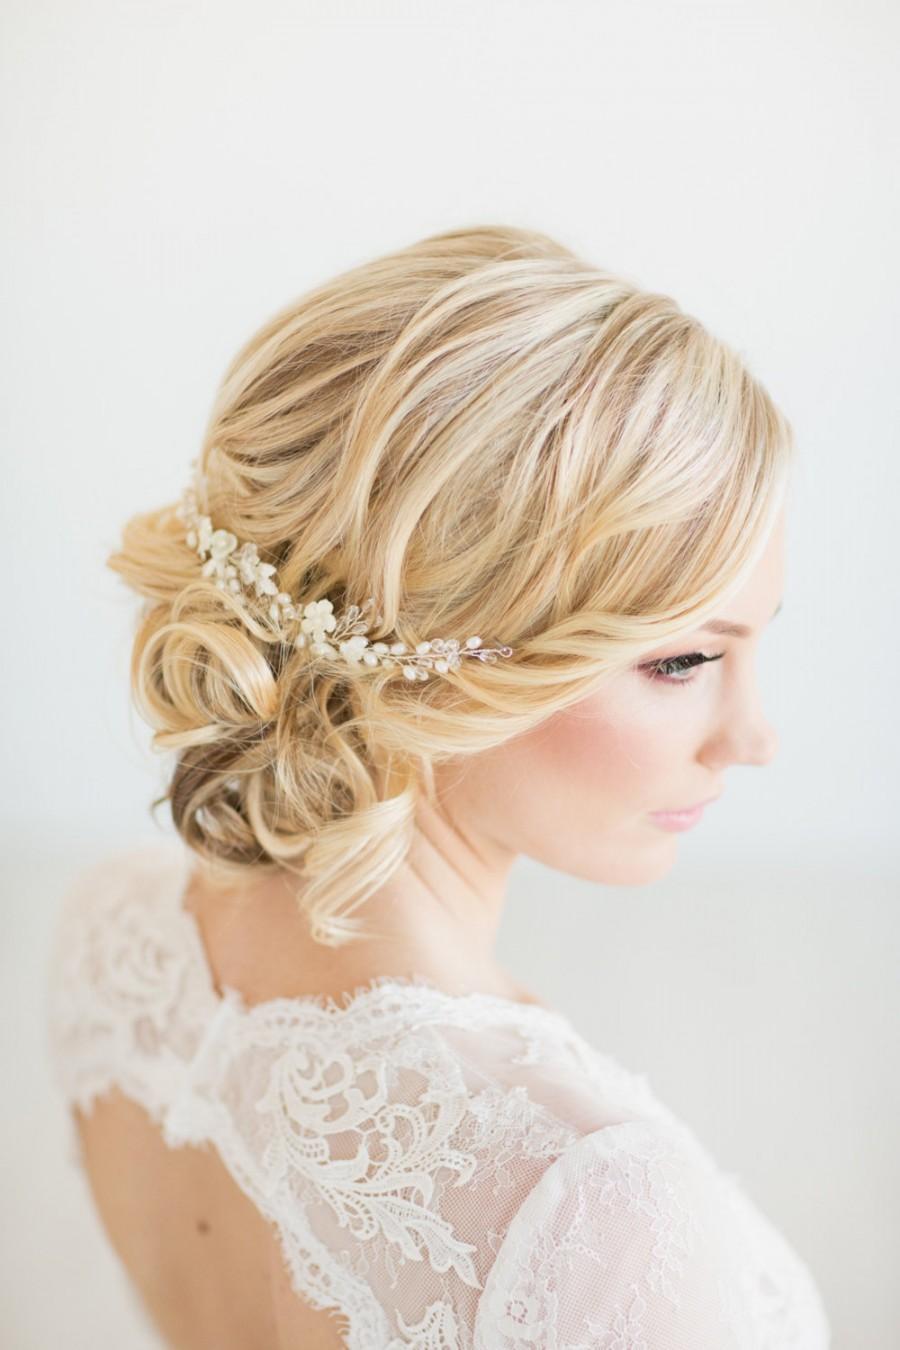 Mariage - Wedding Hair Vine,  Gold Bridal Headpiece, Bridal Hair Accessory, Pearl Hair Vine, Wedding Hairpiece